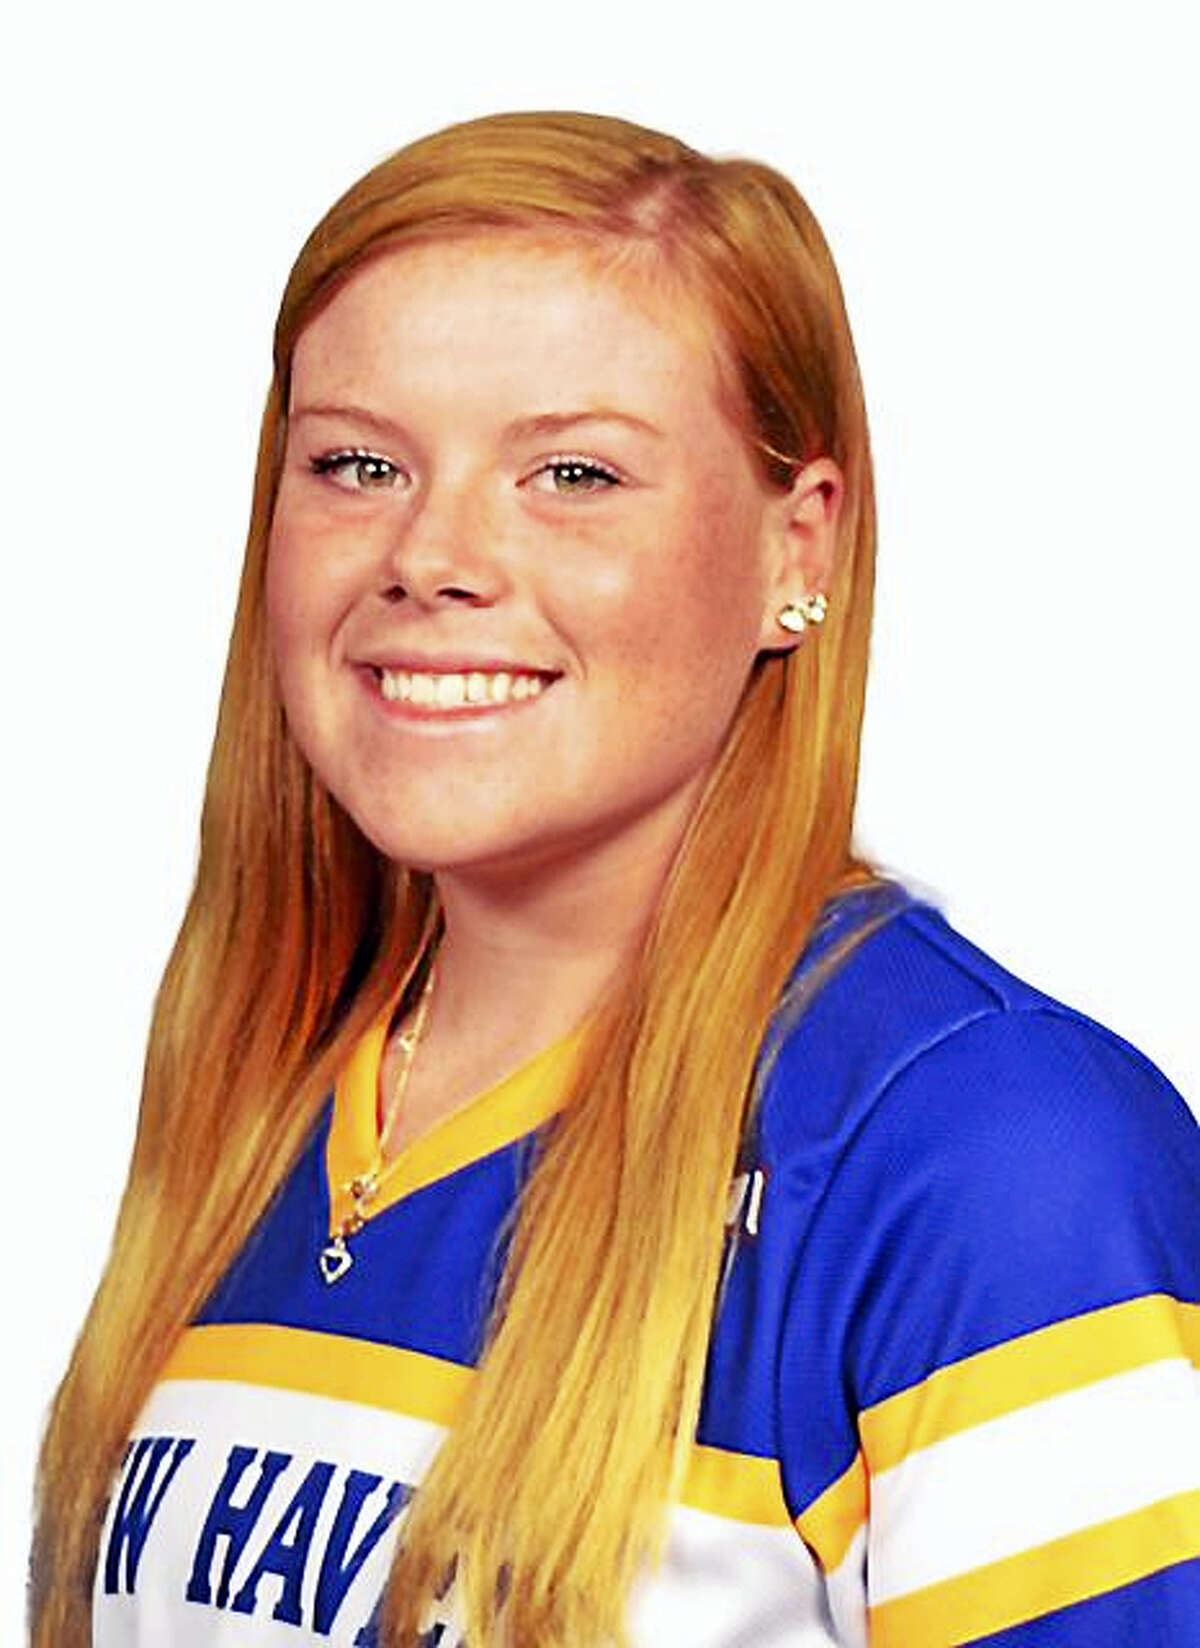 Allie McGrory